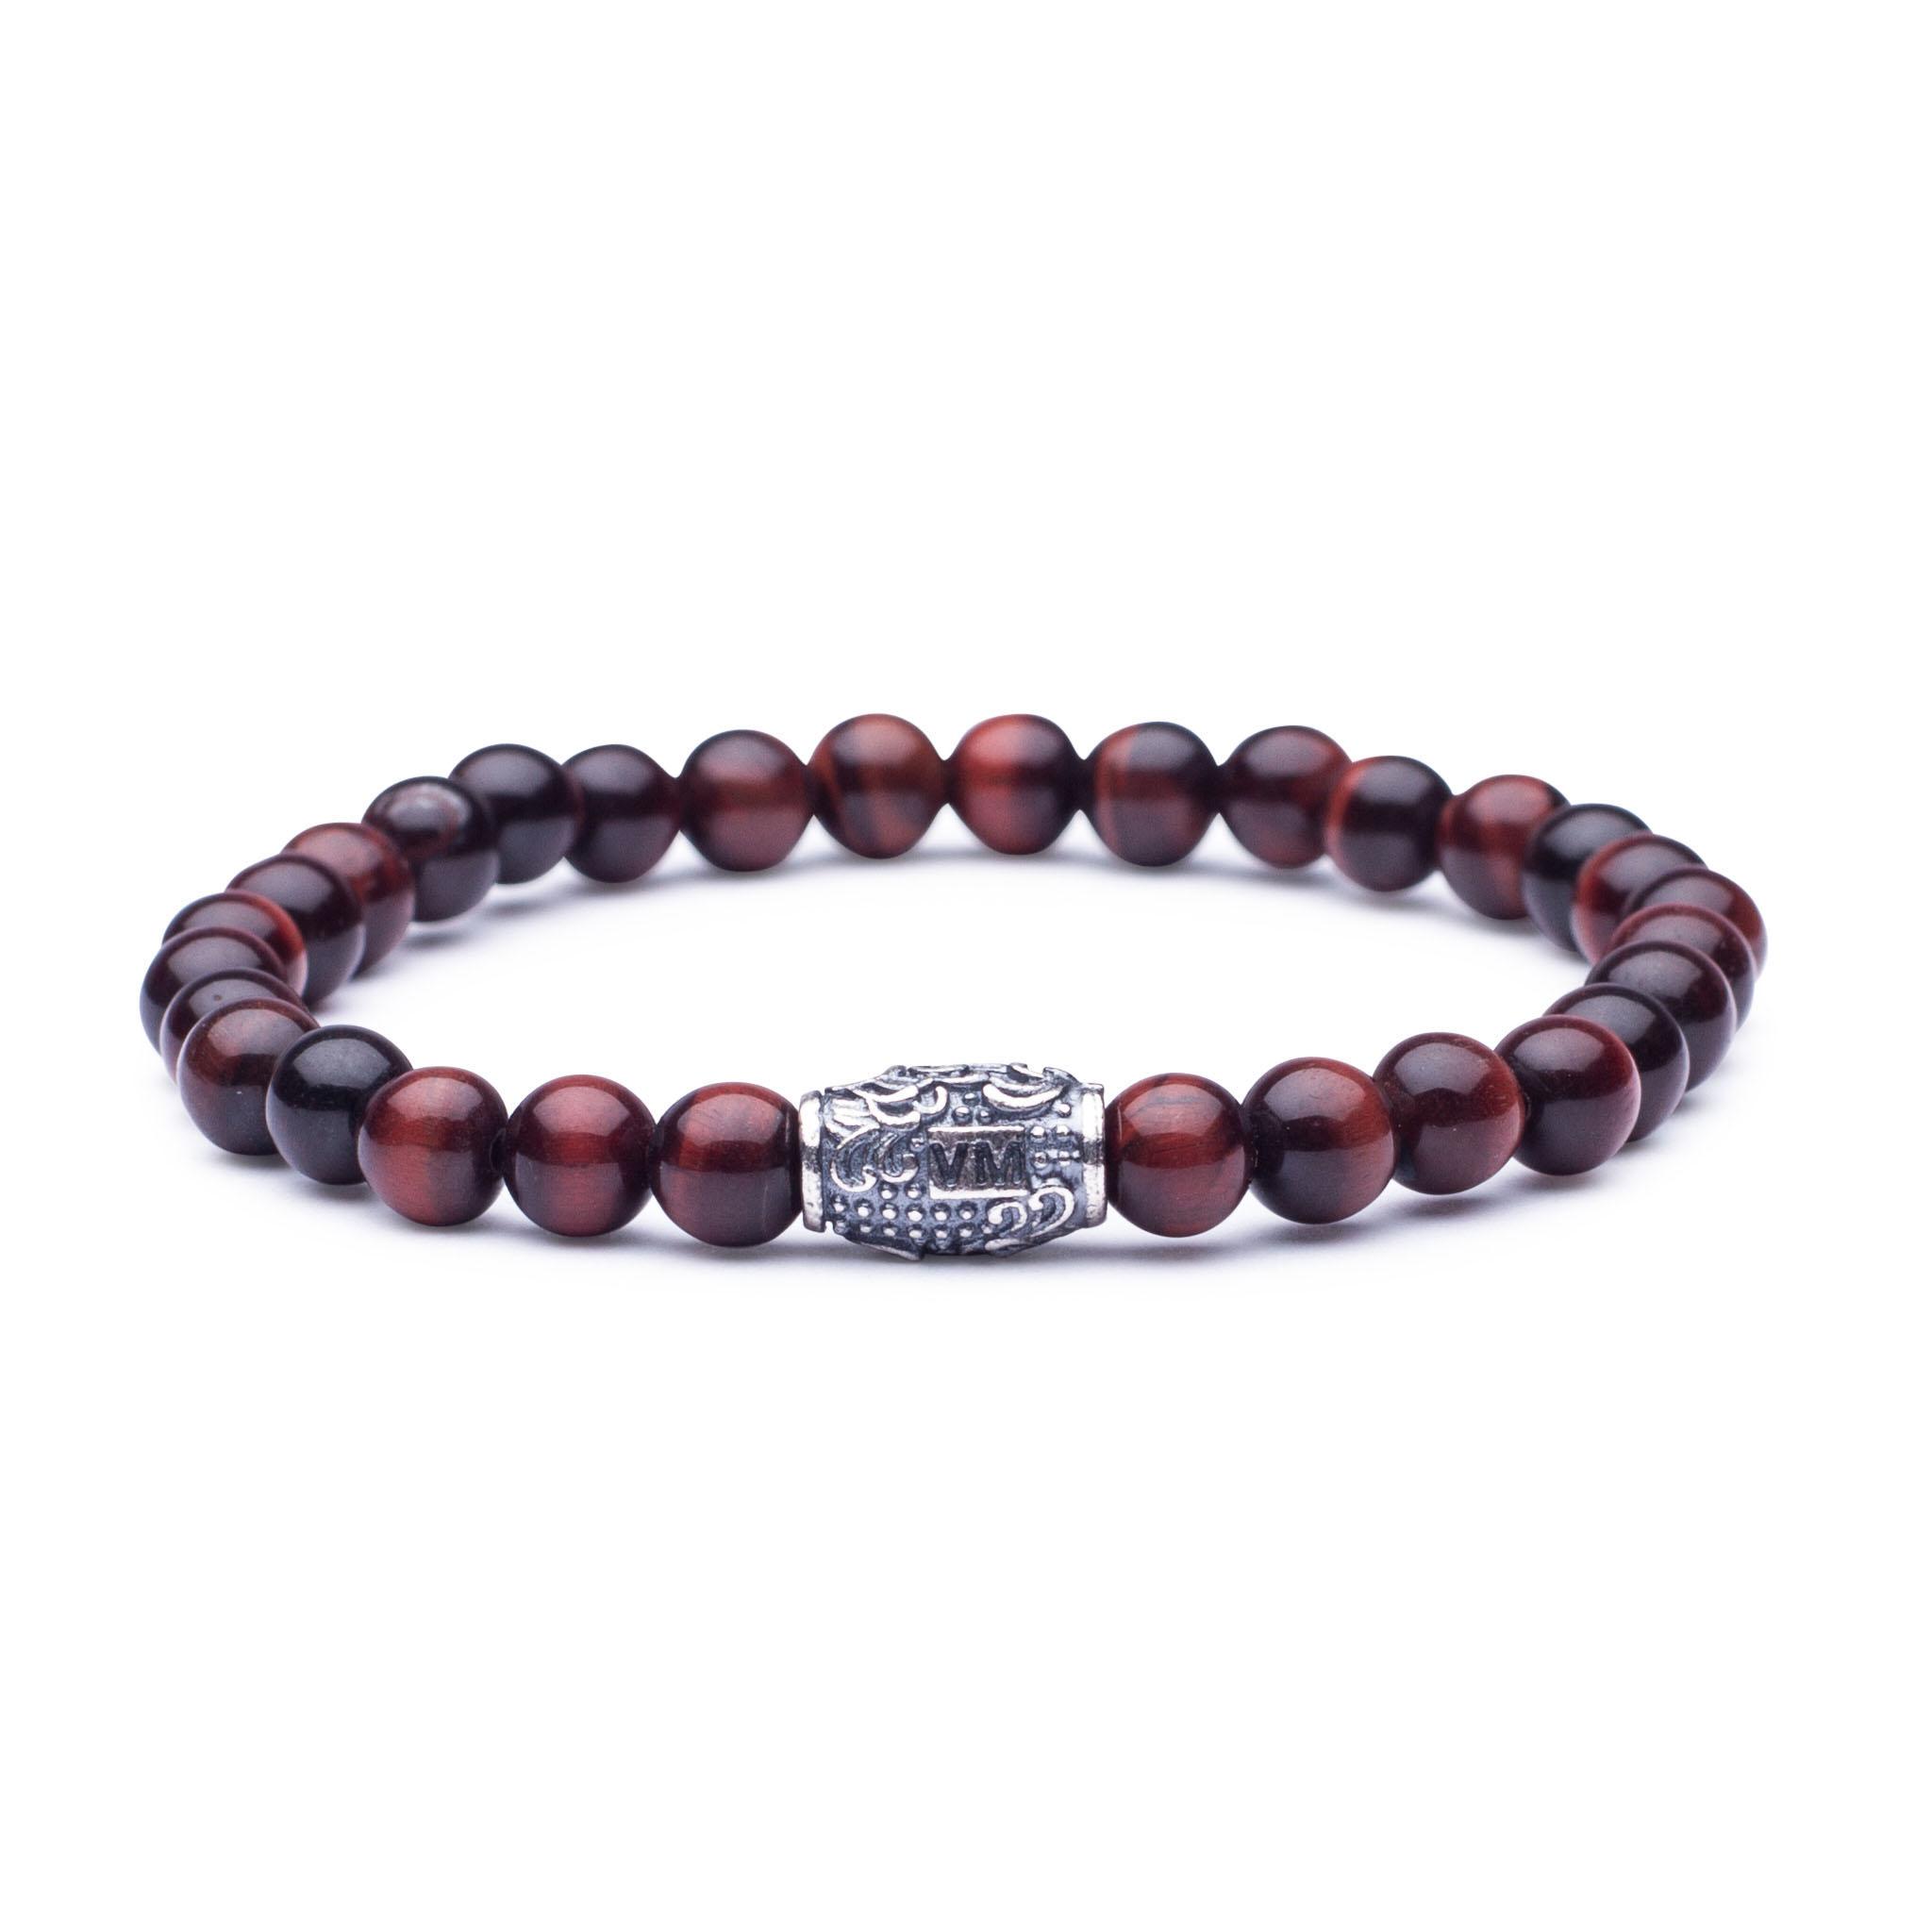 bracelet homme viola milano